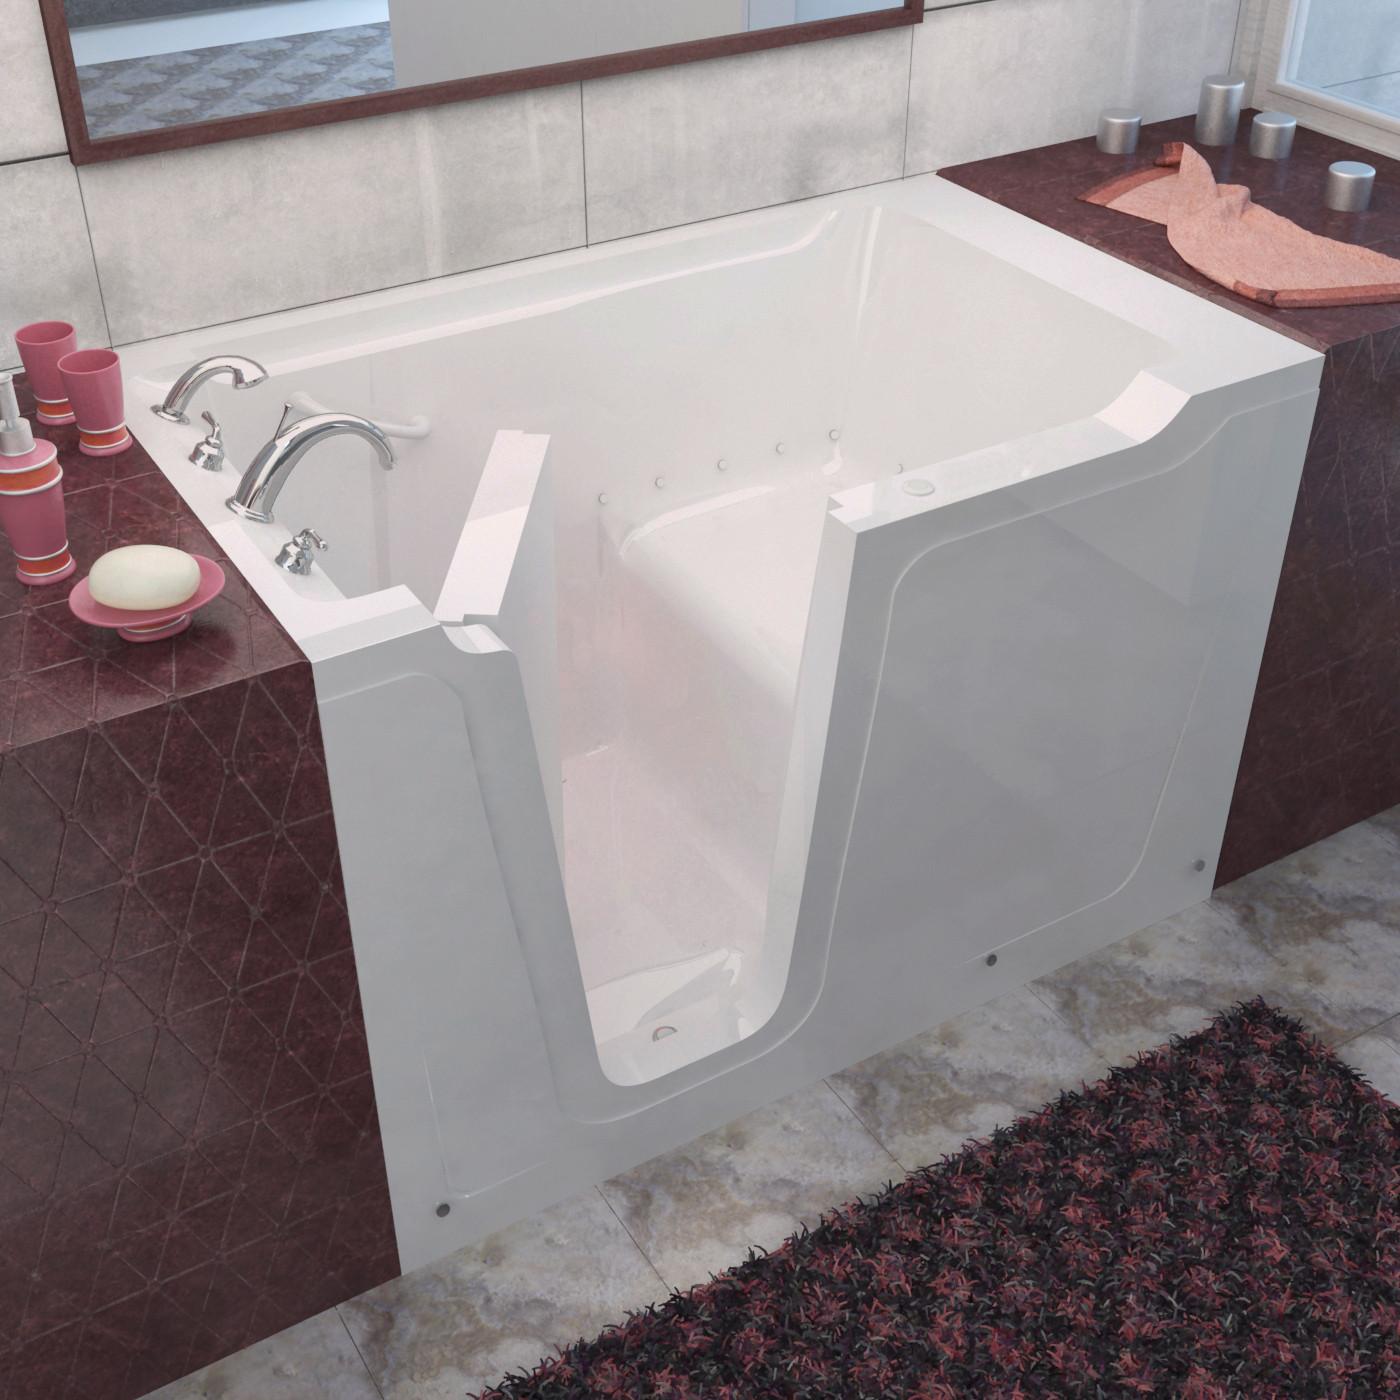 MediTub 3660LWA Walk-In 36 x 60 Left Drain White Air Jetted Bathtub